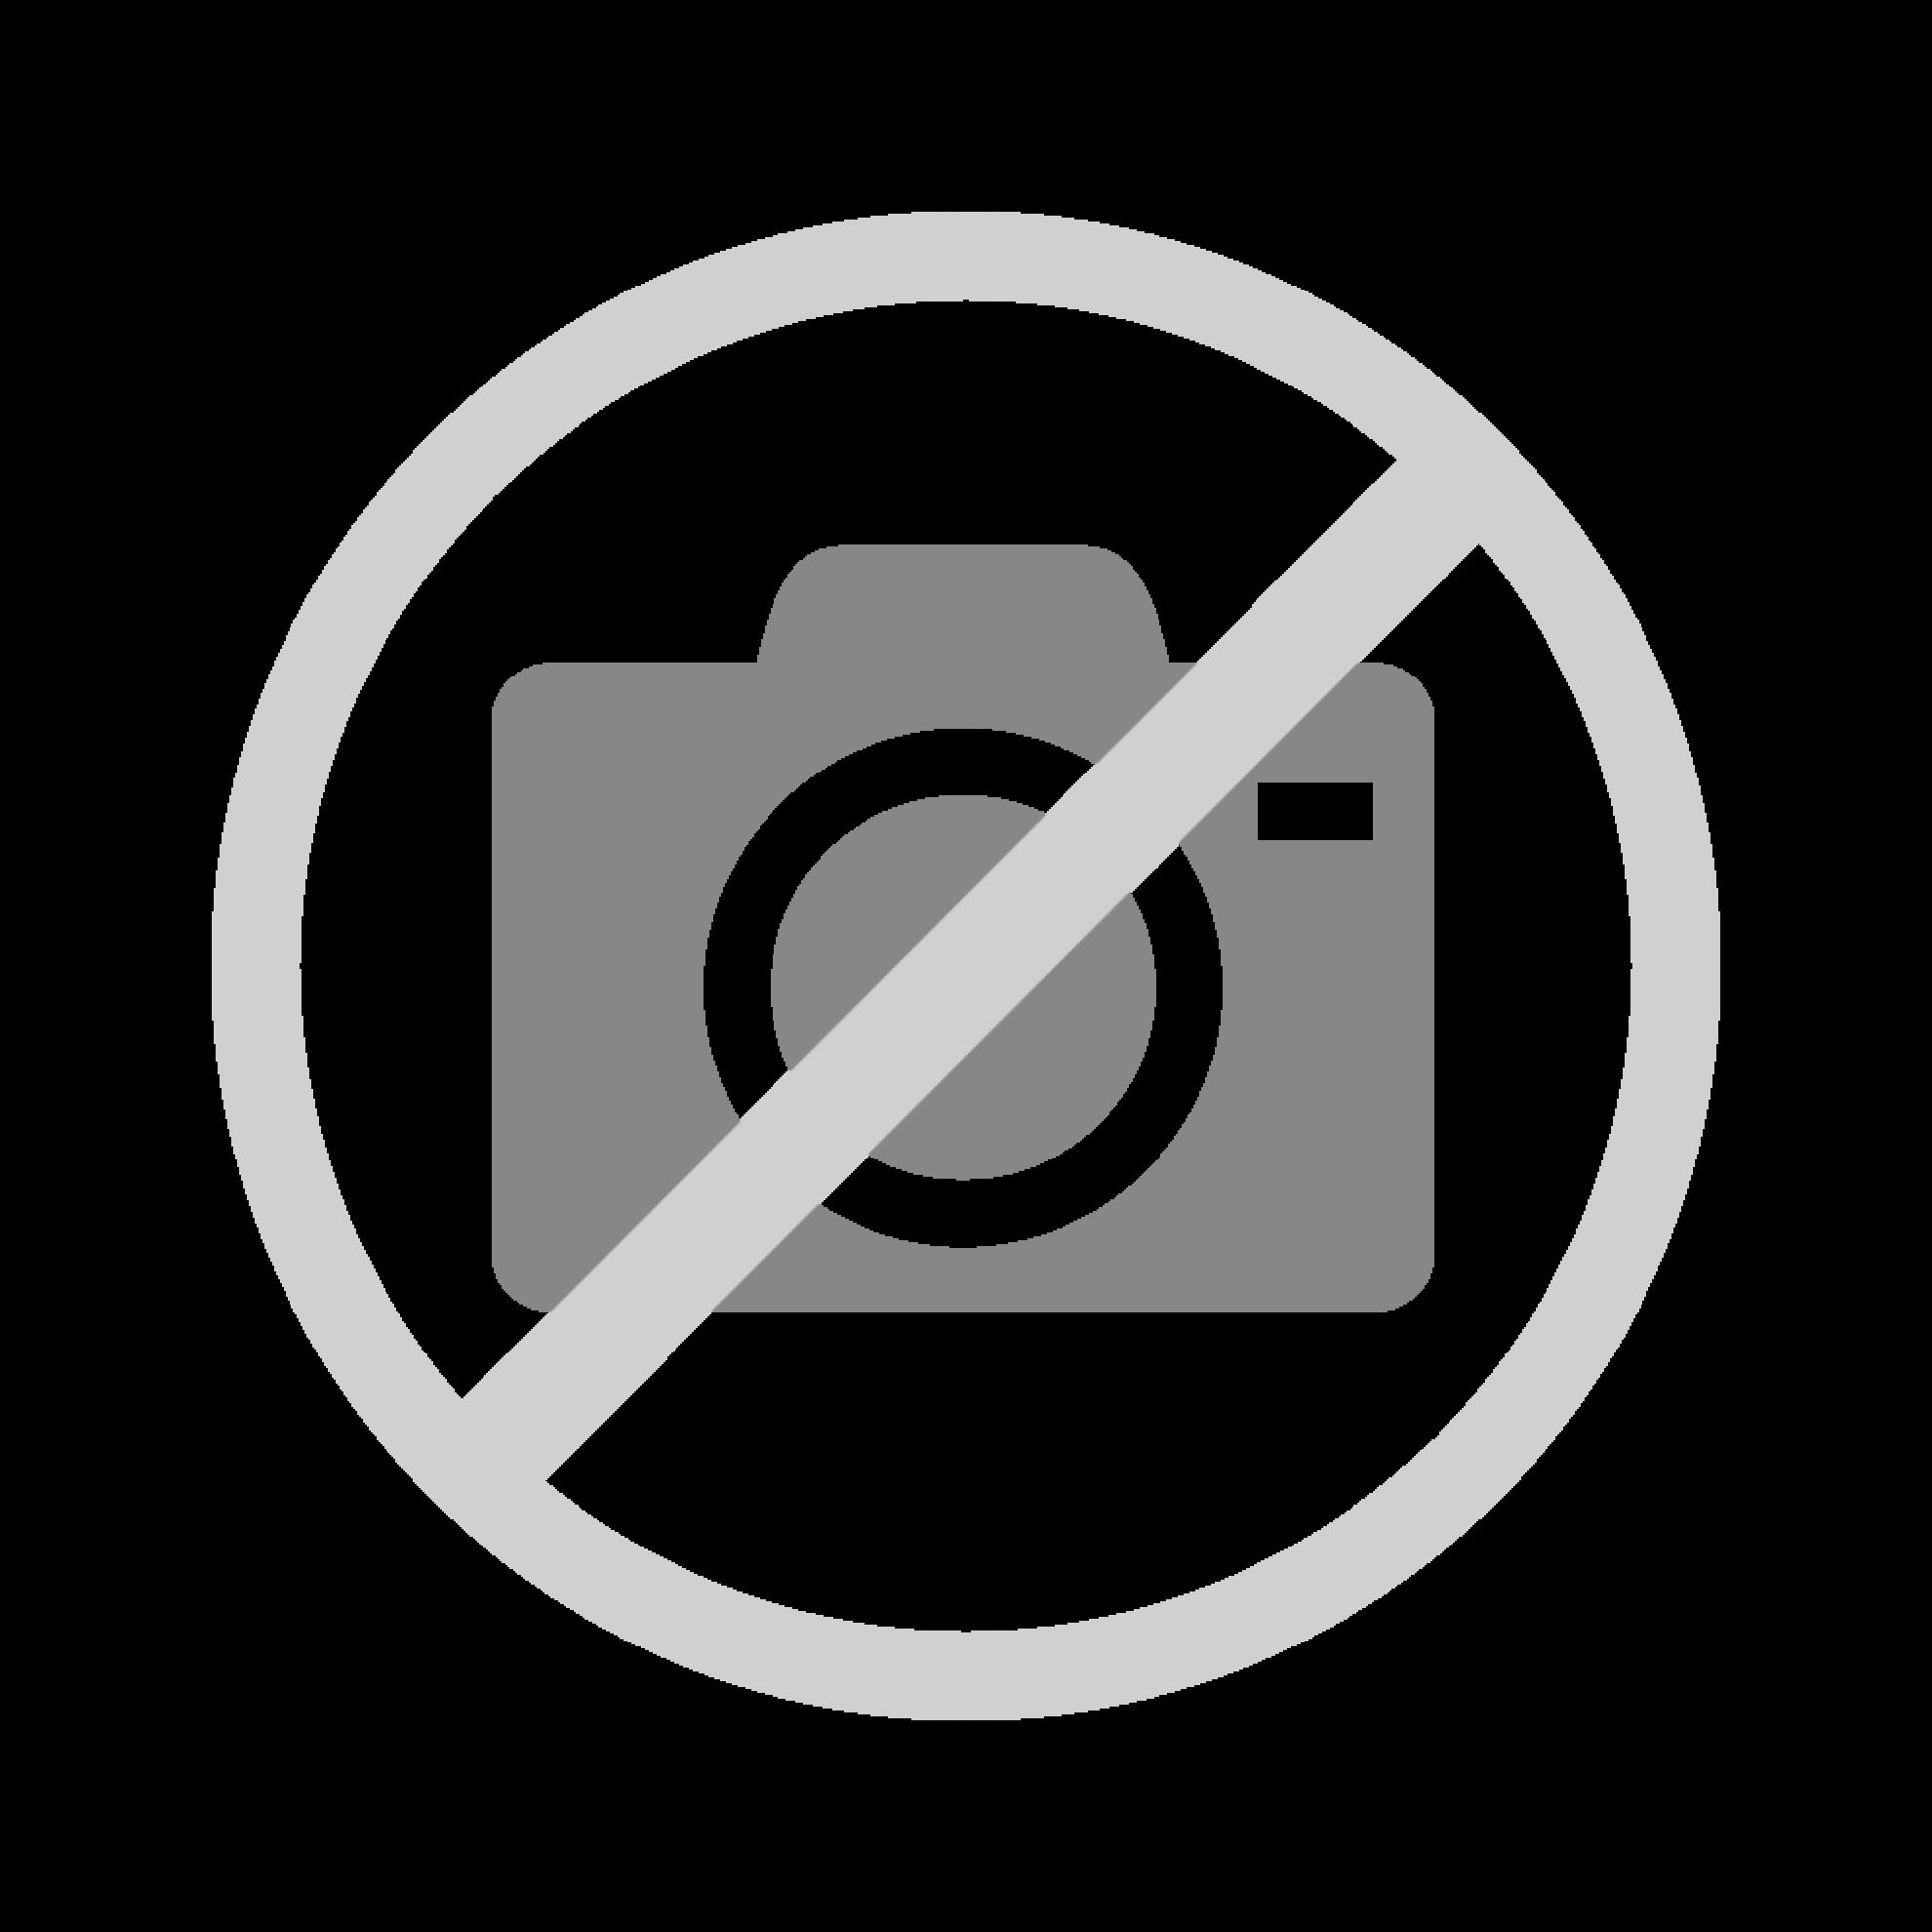 orient spiegel riyad aus versilbertem messing h 200cm. Black Bedroom Furniture Sets. Home Design Ideas